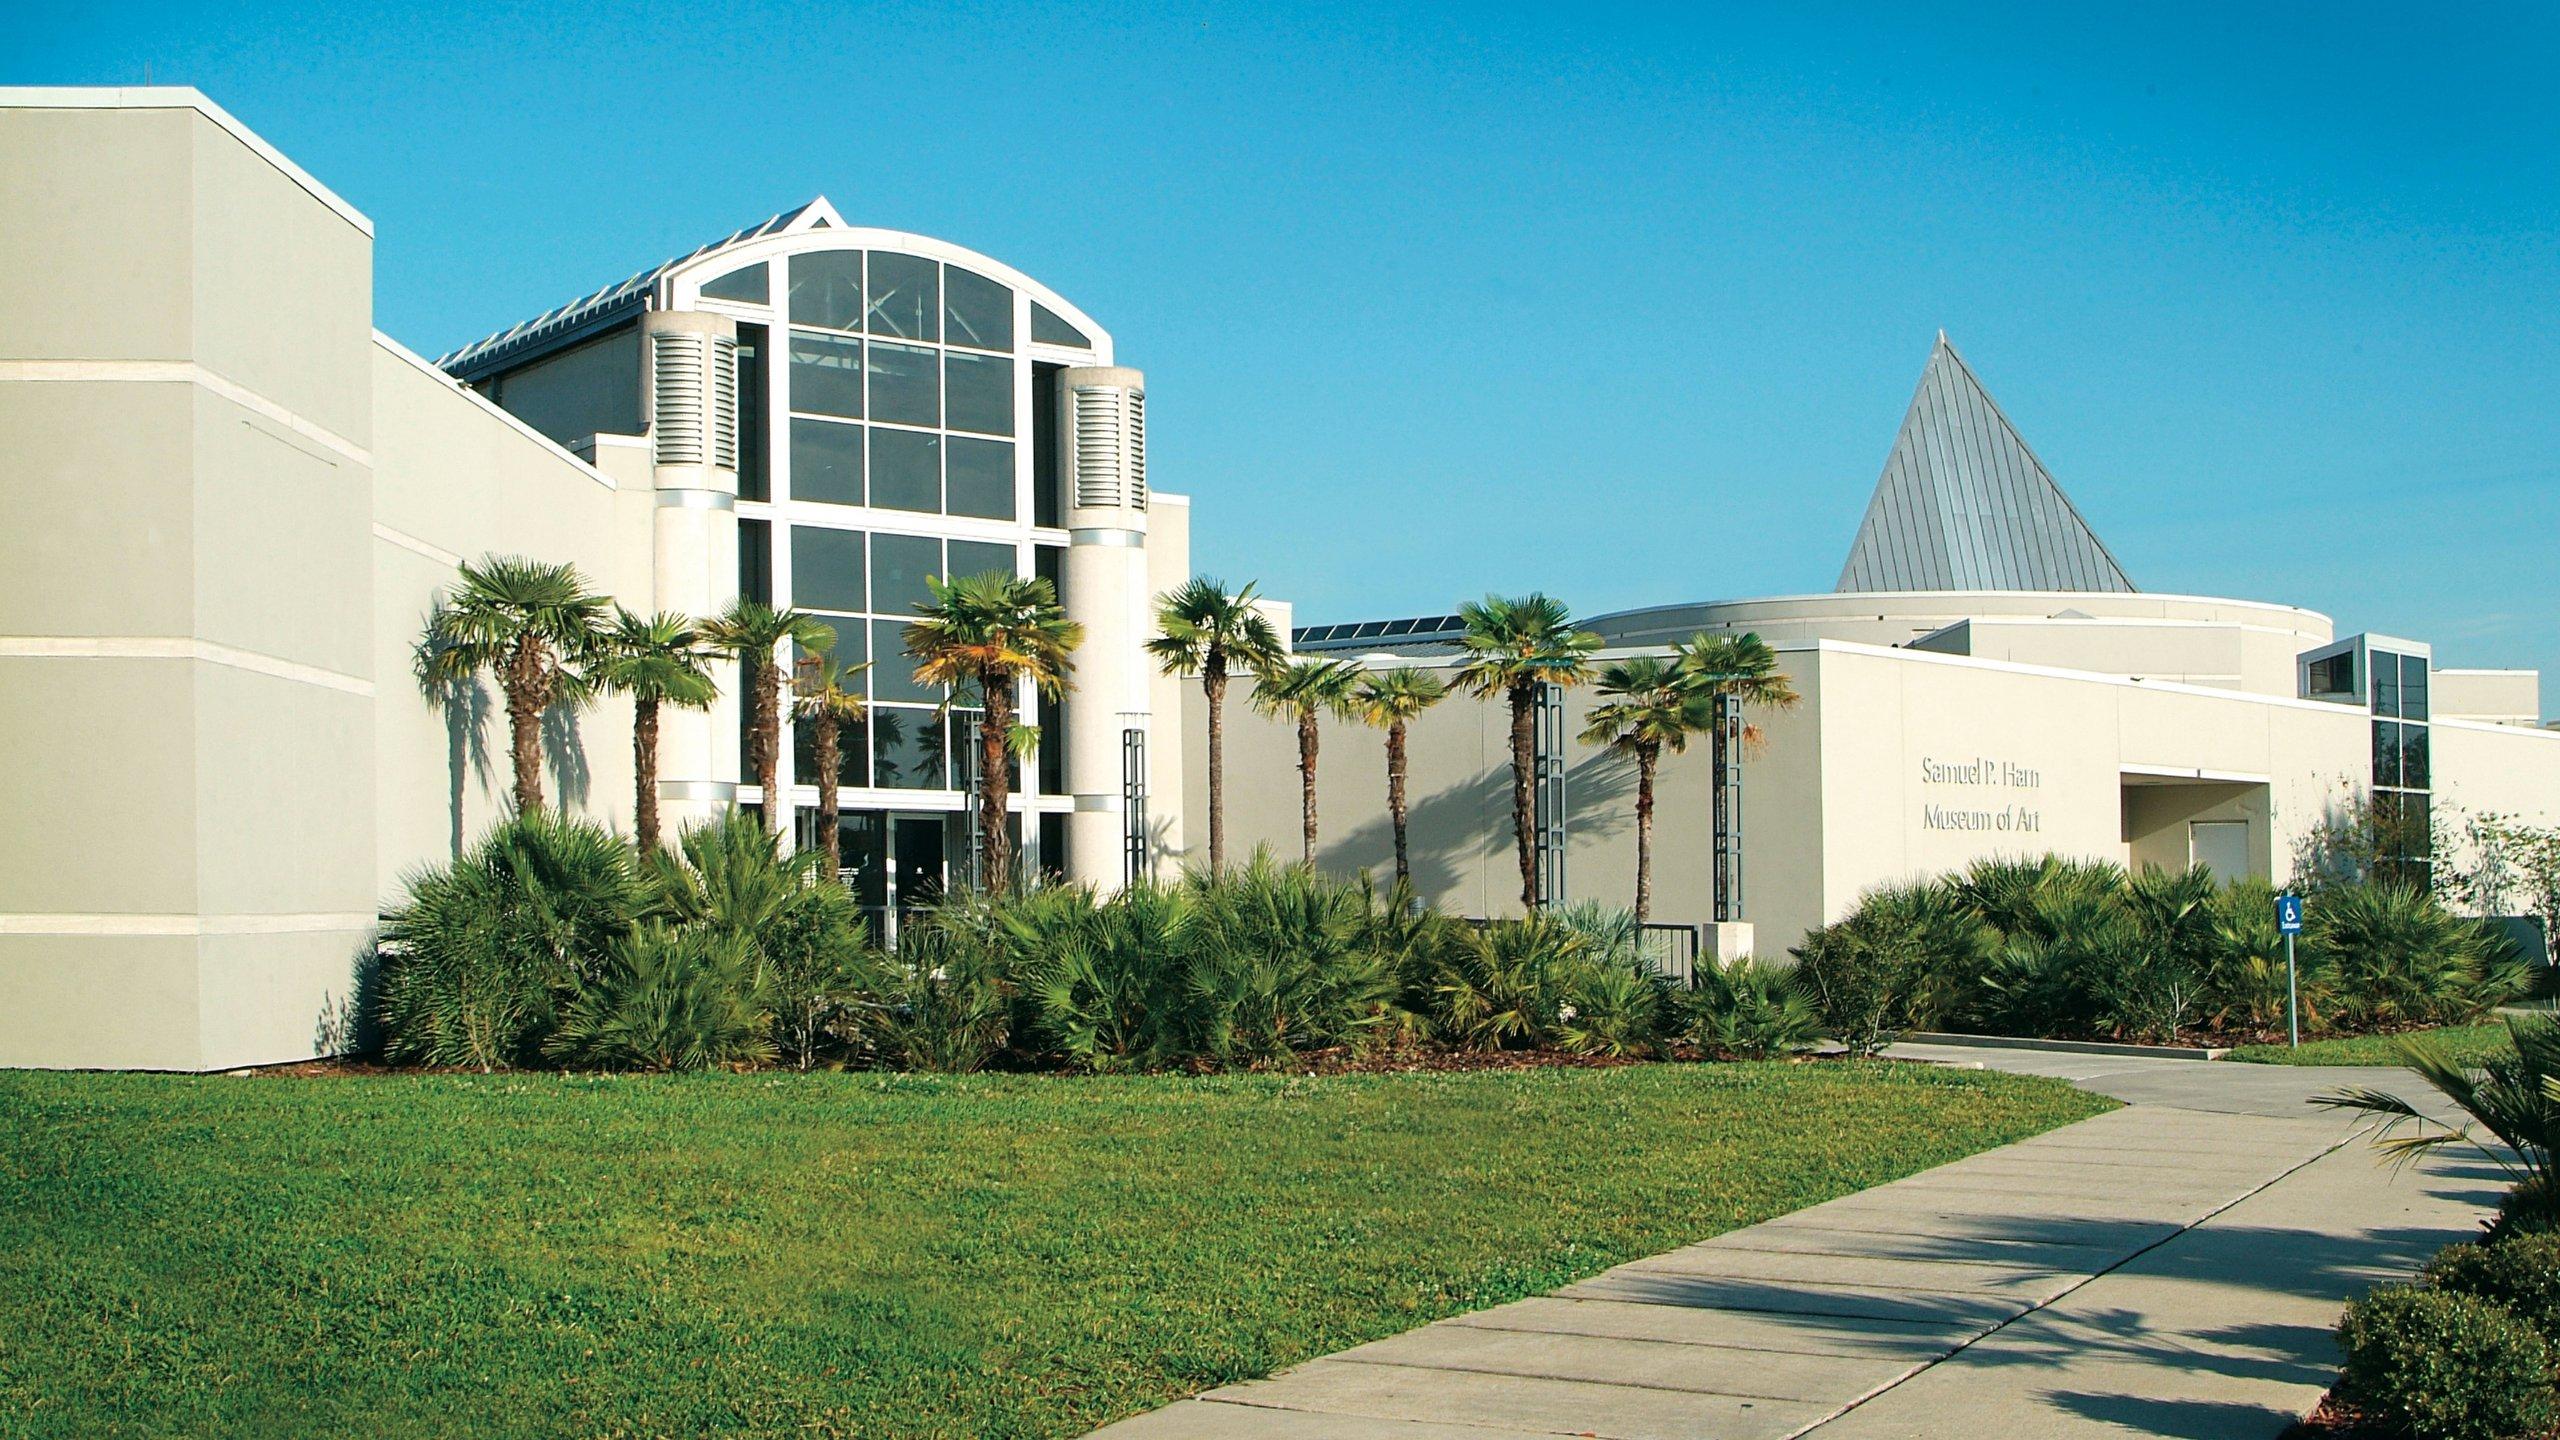 North Central Florida, Florida, United States of America